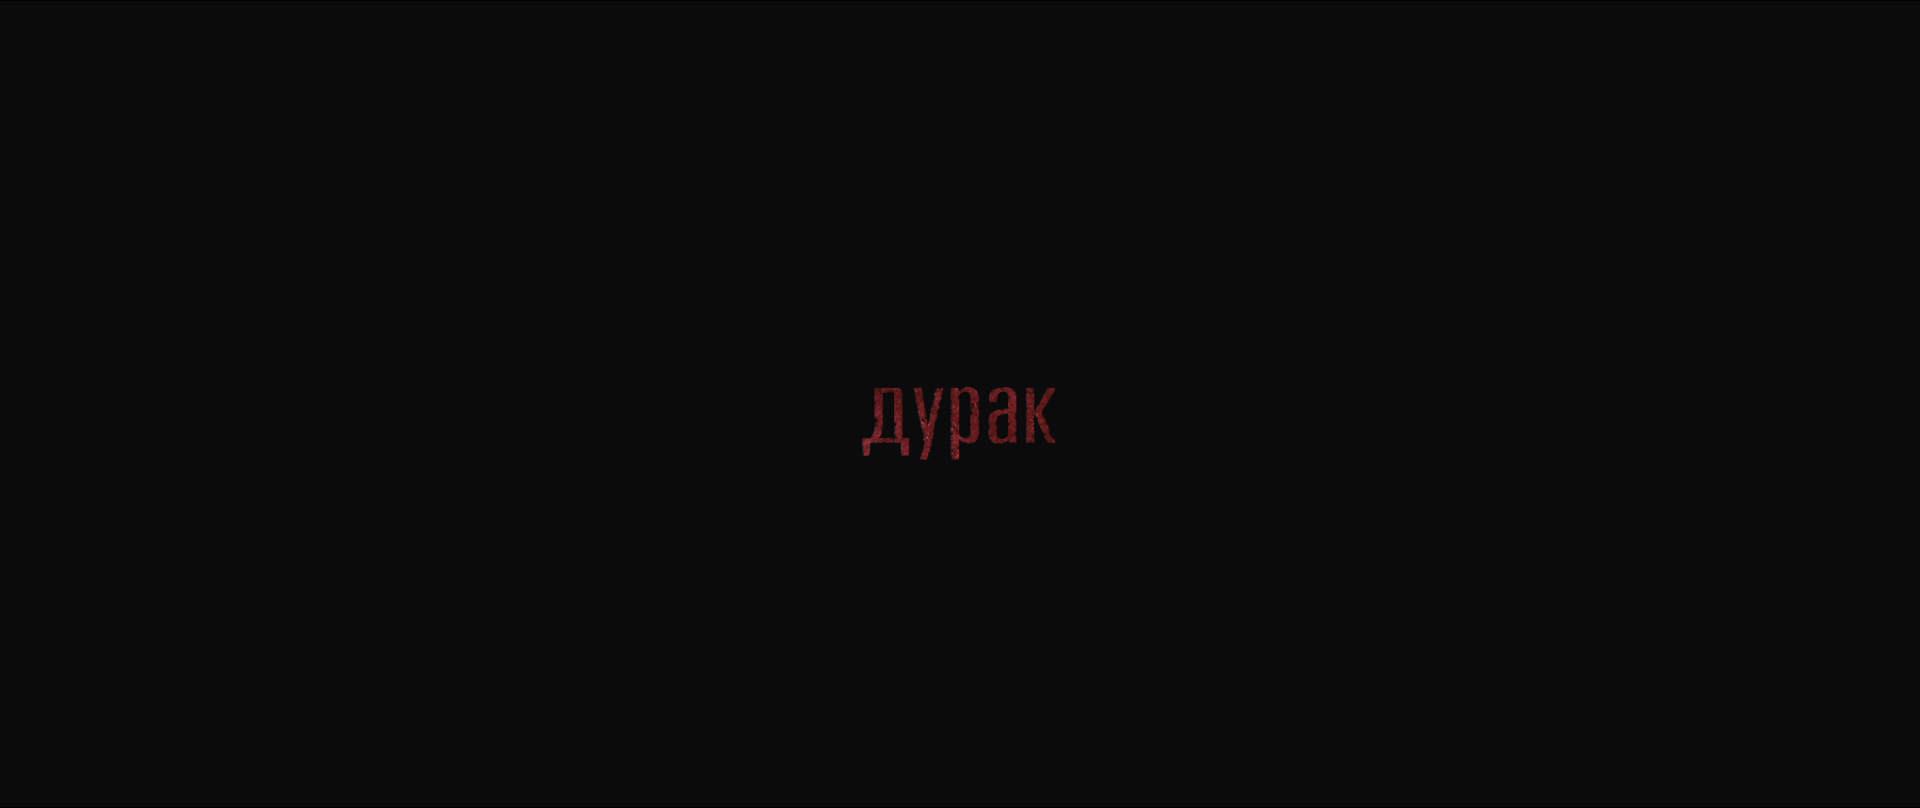 http://i2.imageban.ru/out/2016/04/29/7f5208e74c3926f59711d6a2e02b81f9.png